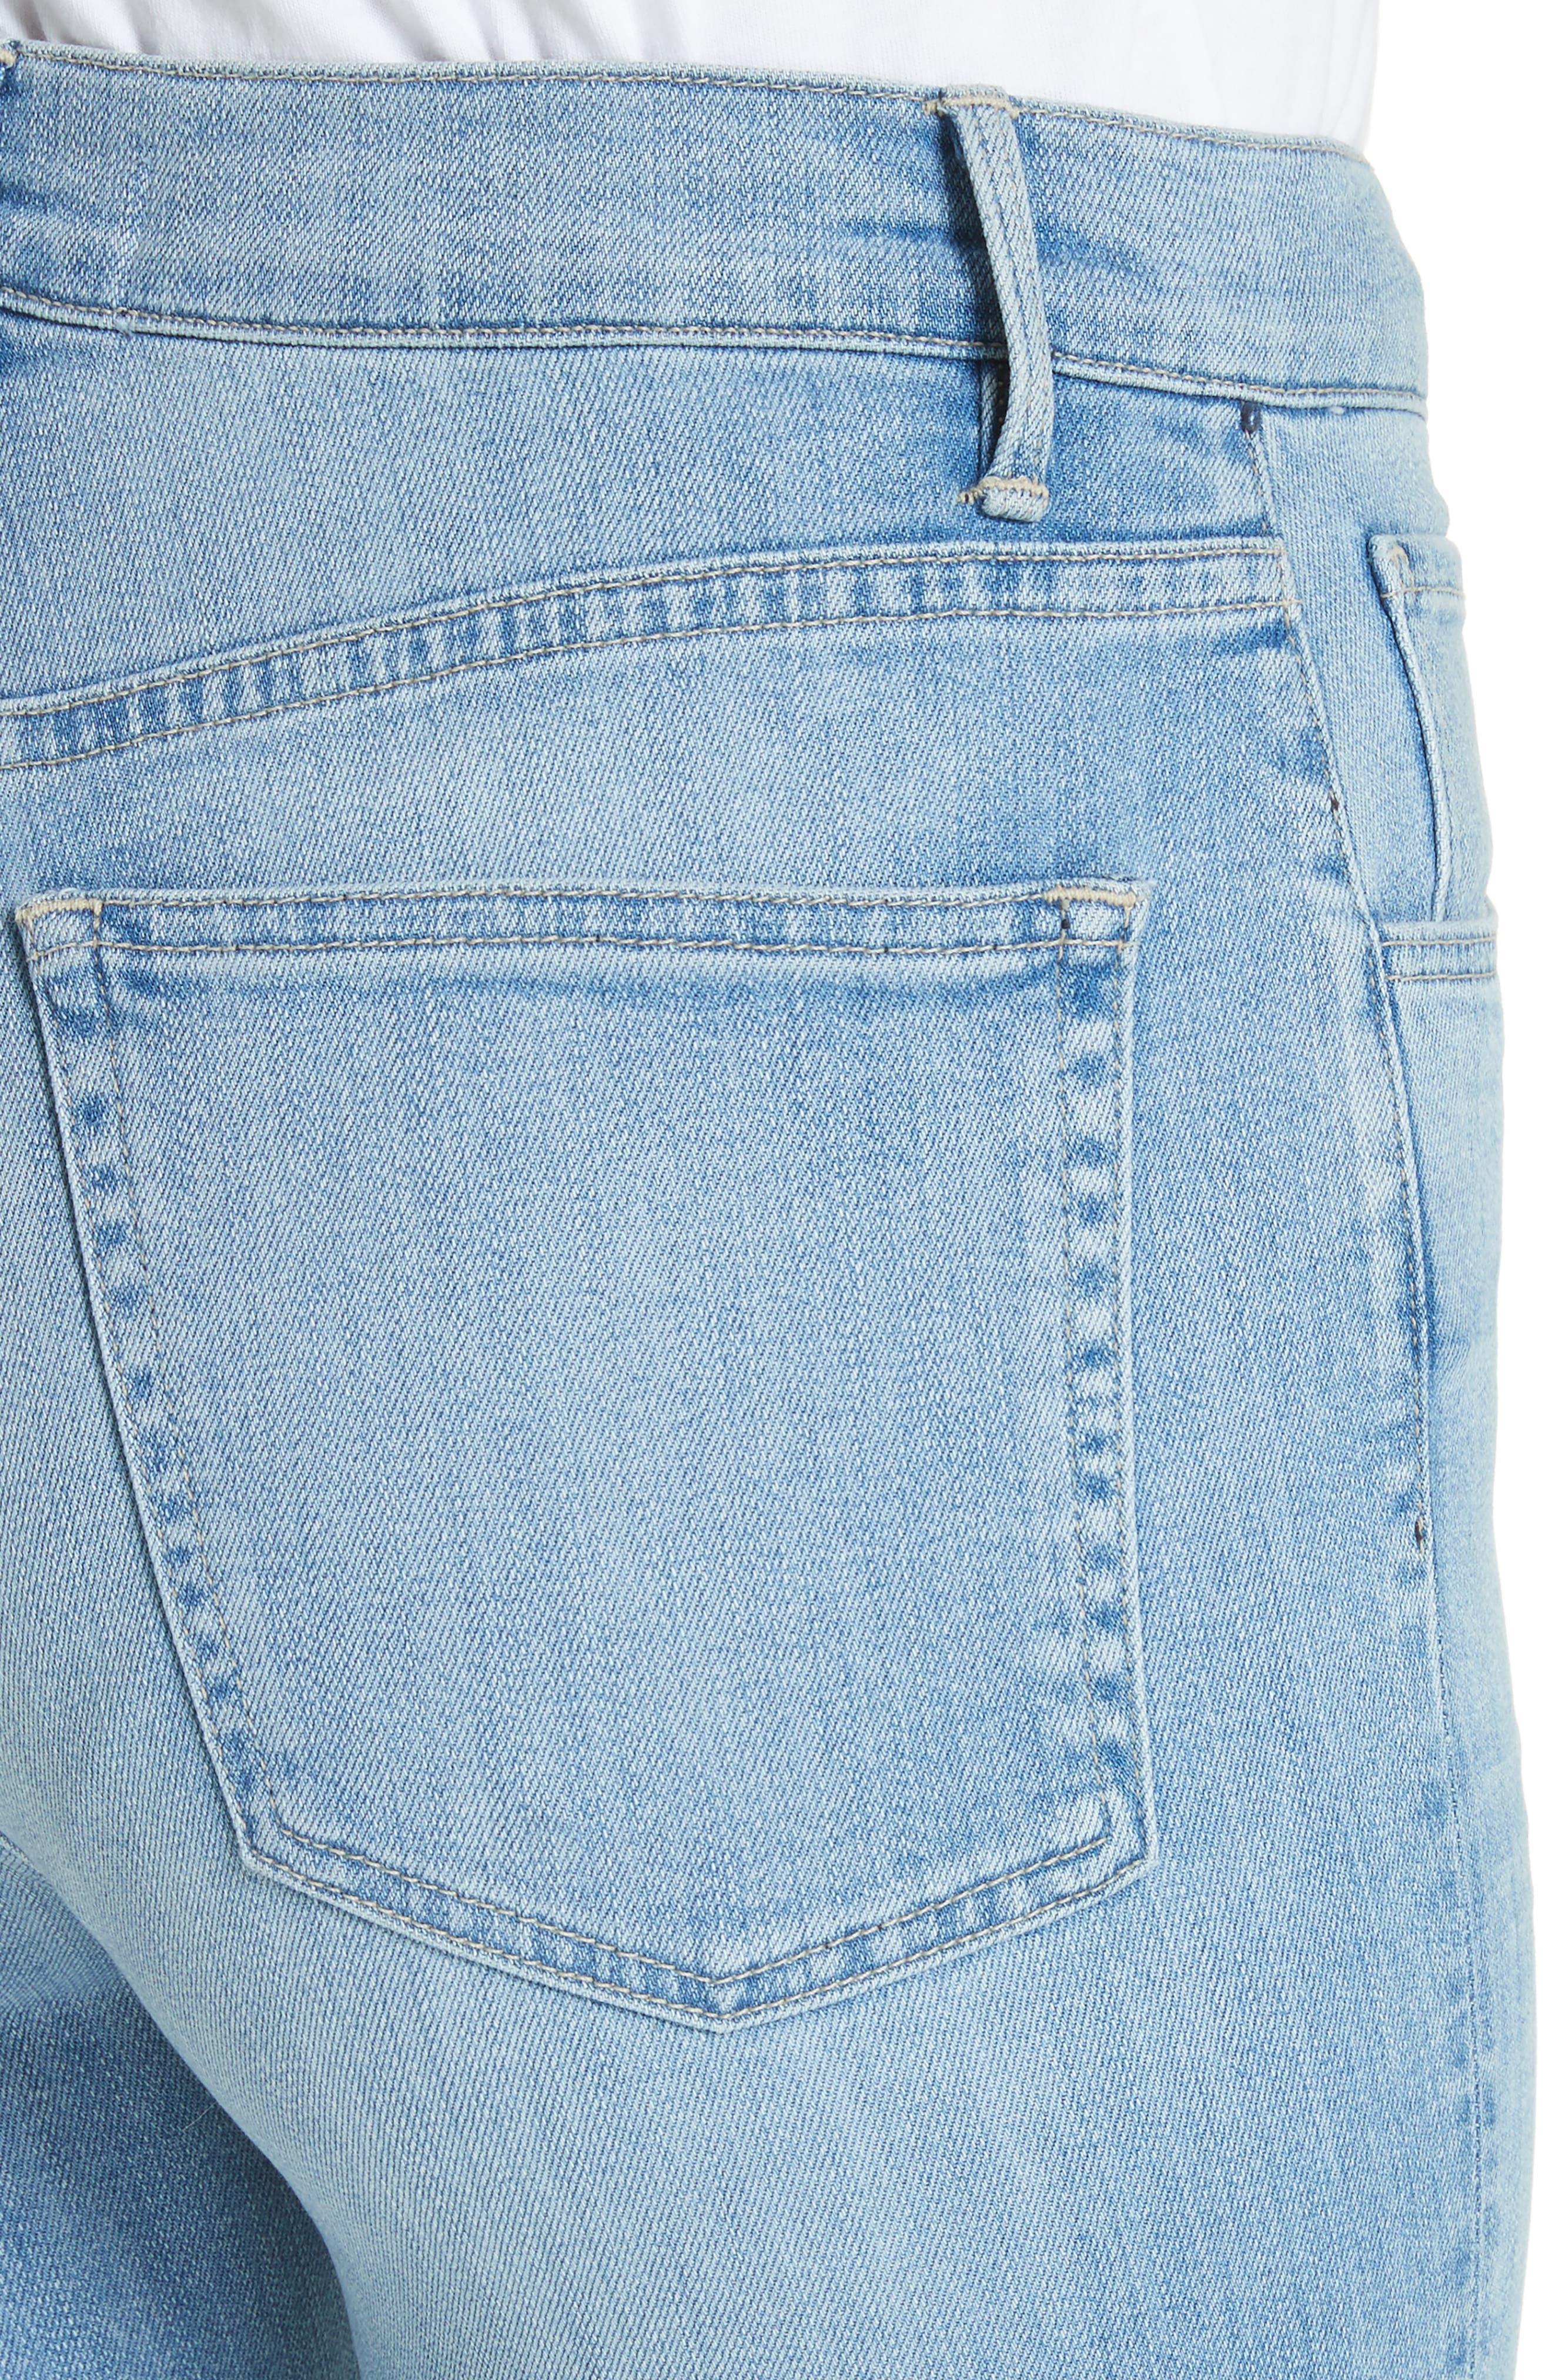 W4 Colette Crop Skinny Jeans,                             Alternate thumbnail 4, color,                             CARLO